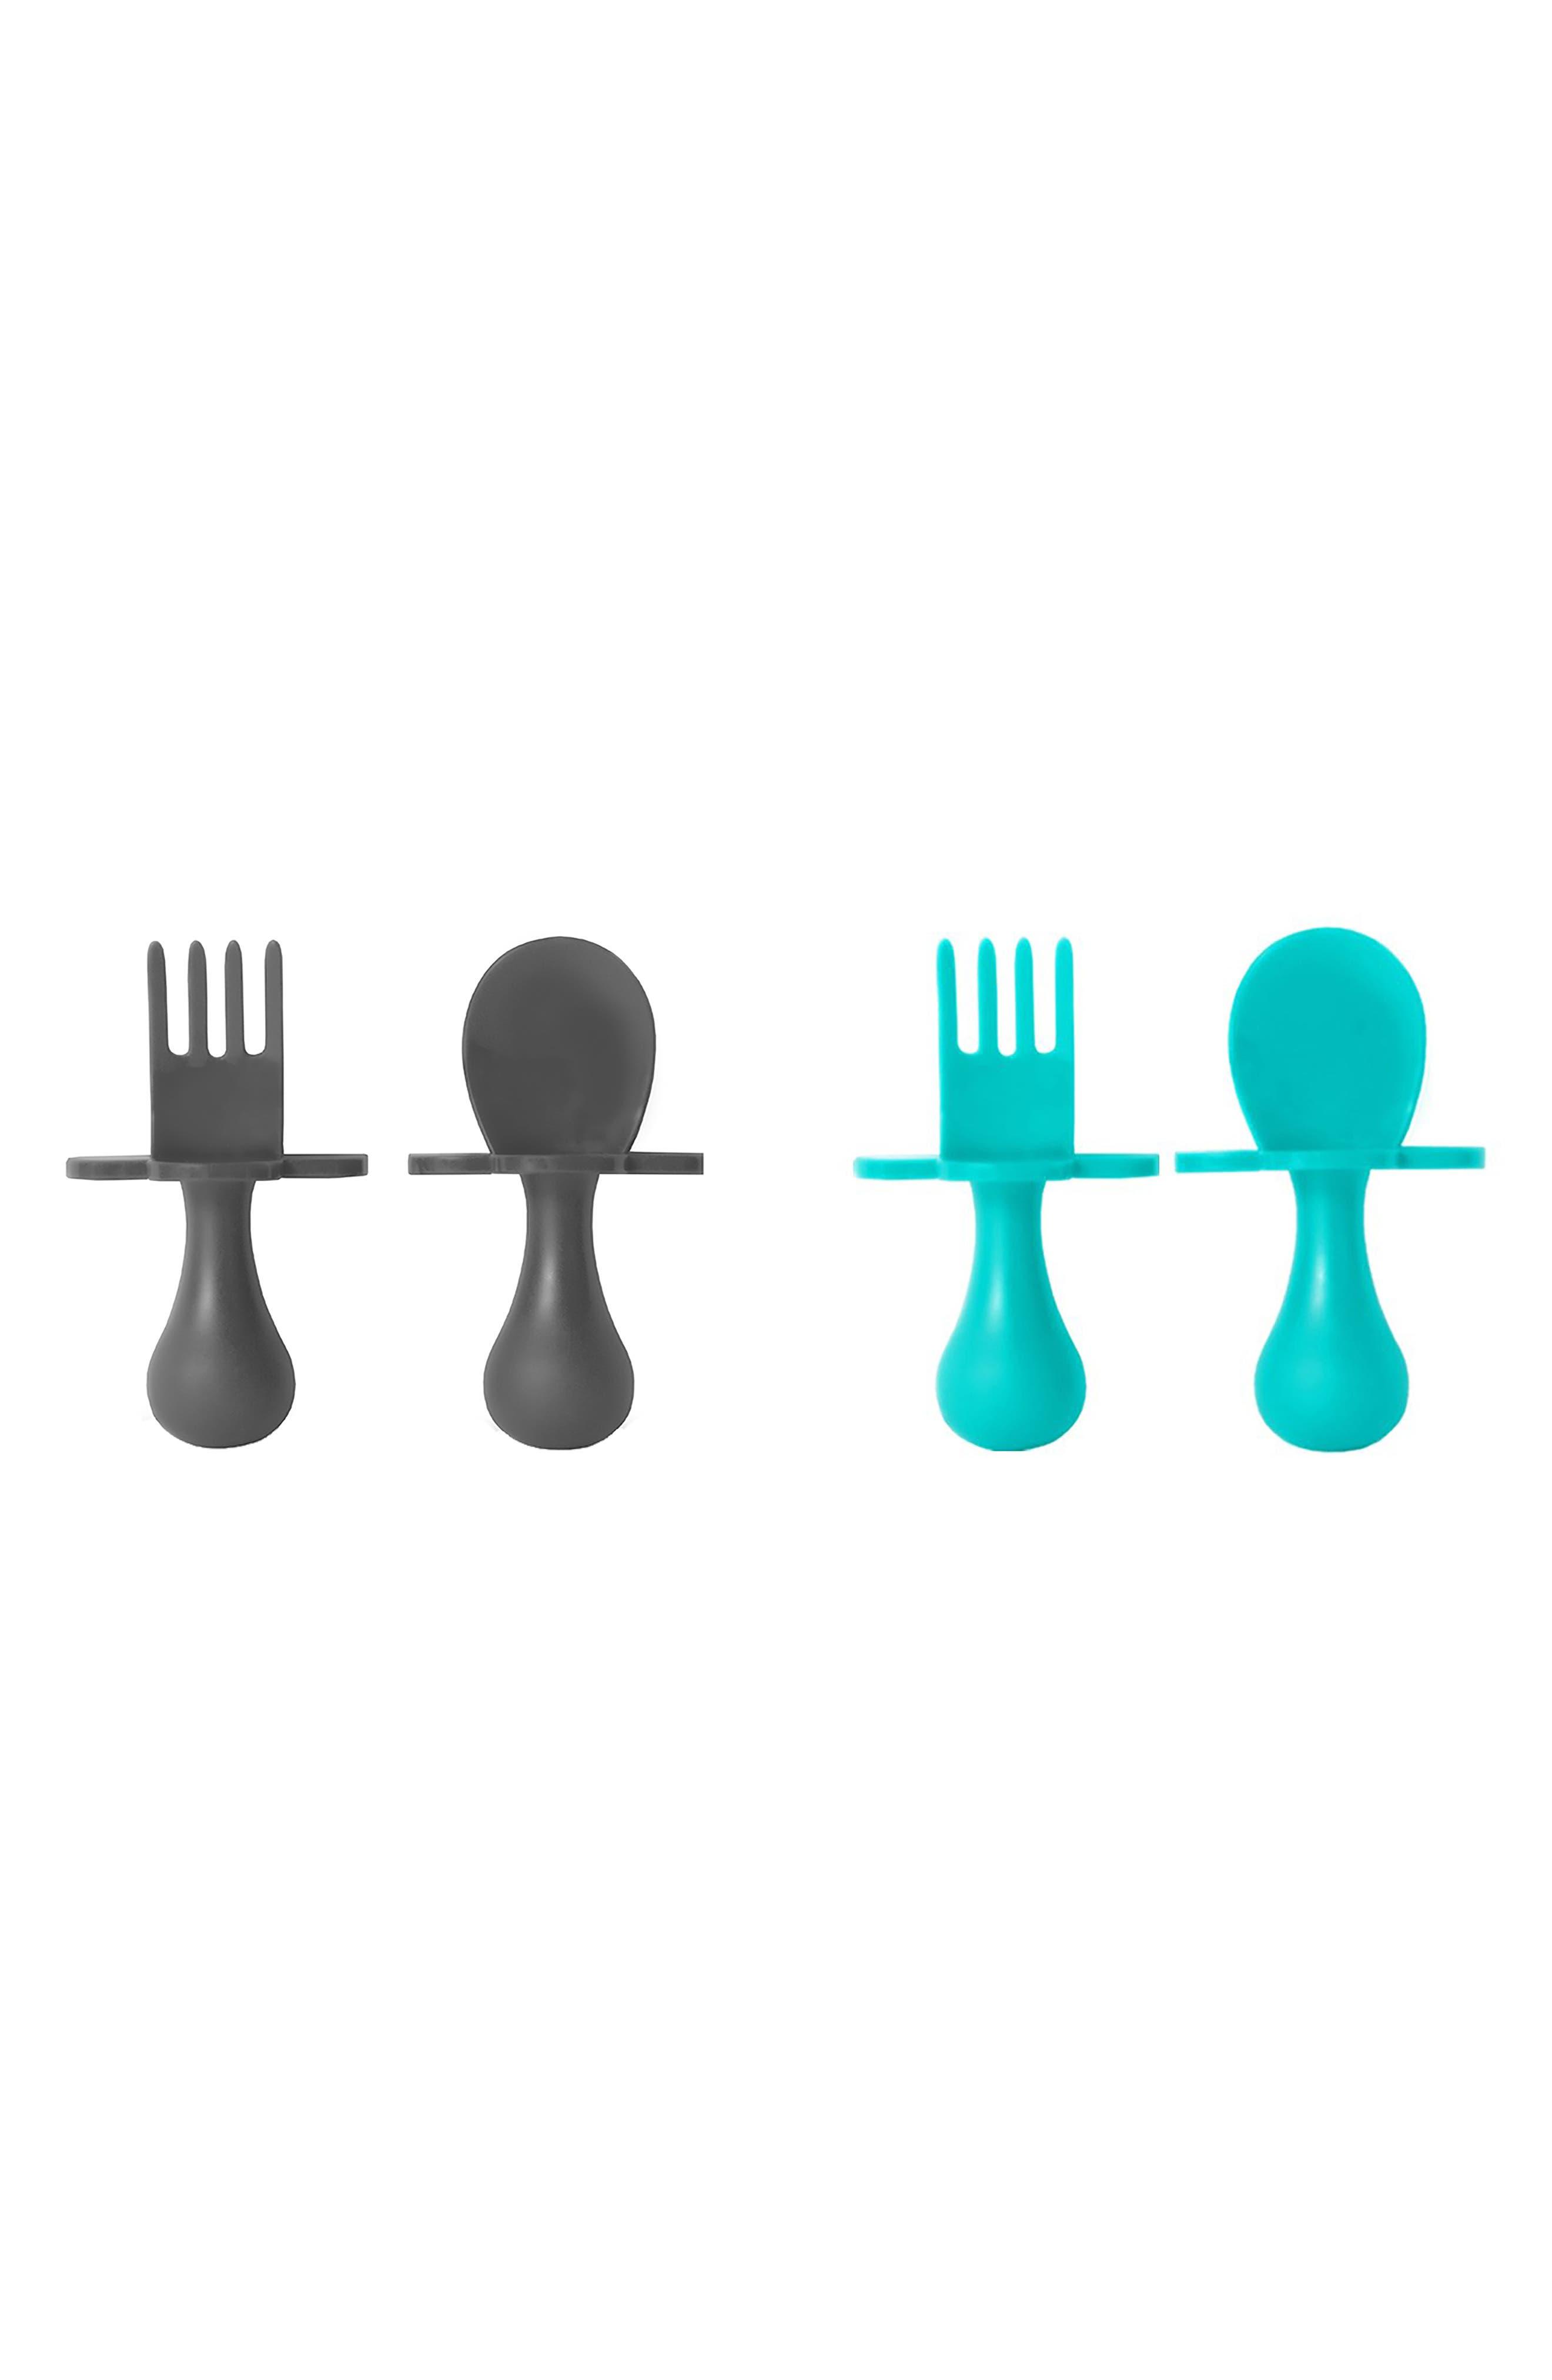 2-Pack Self Feeding Fork & Spoon Set,                             Main thumbnail 1, color,                             GRAY/ TEAL